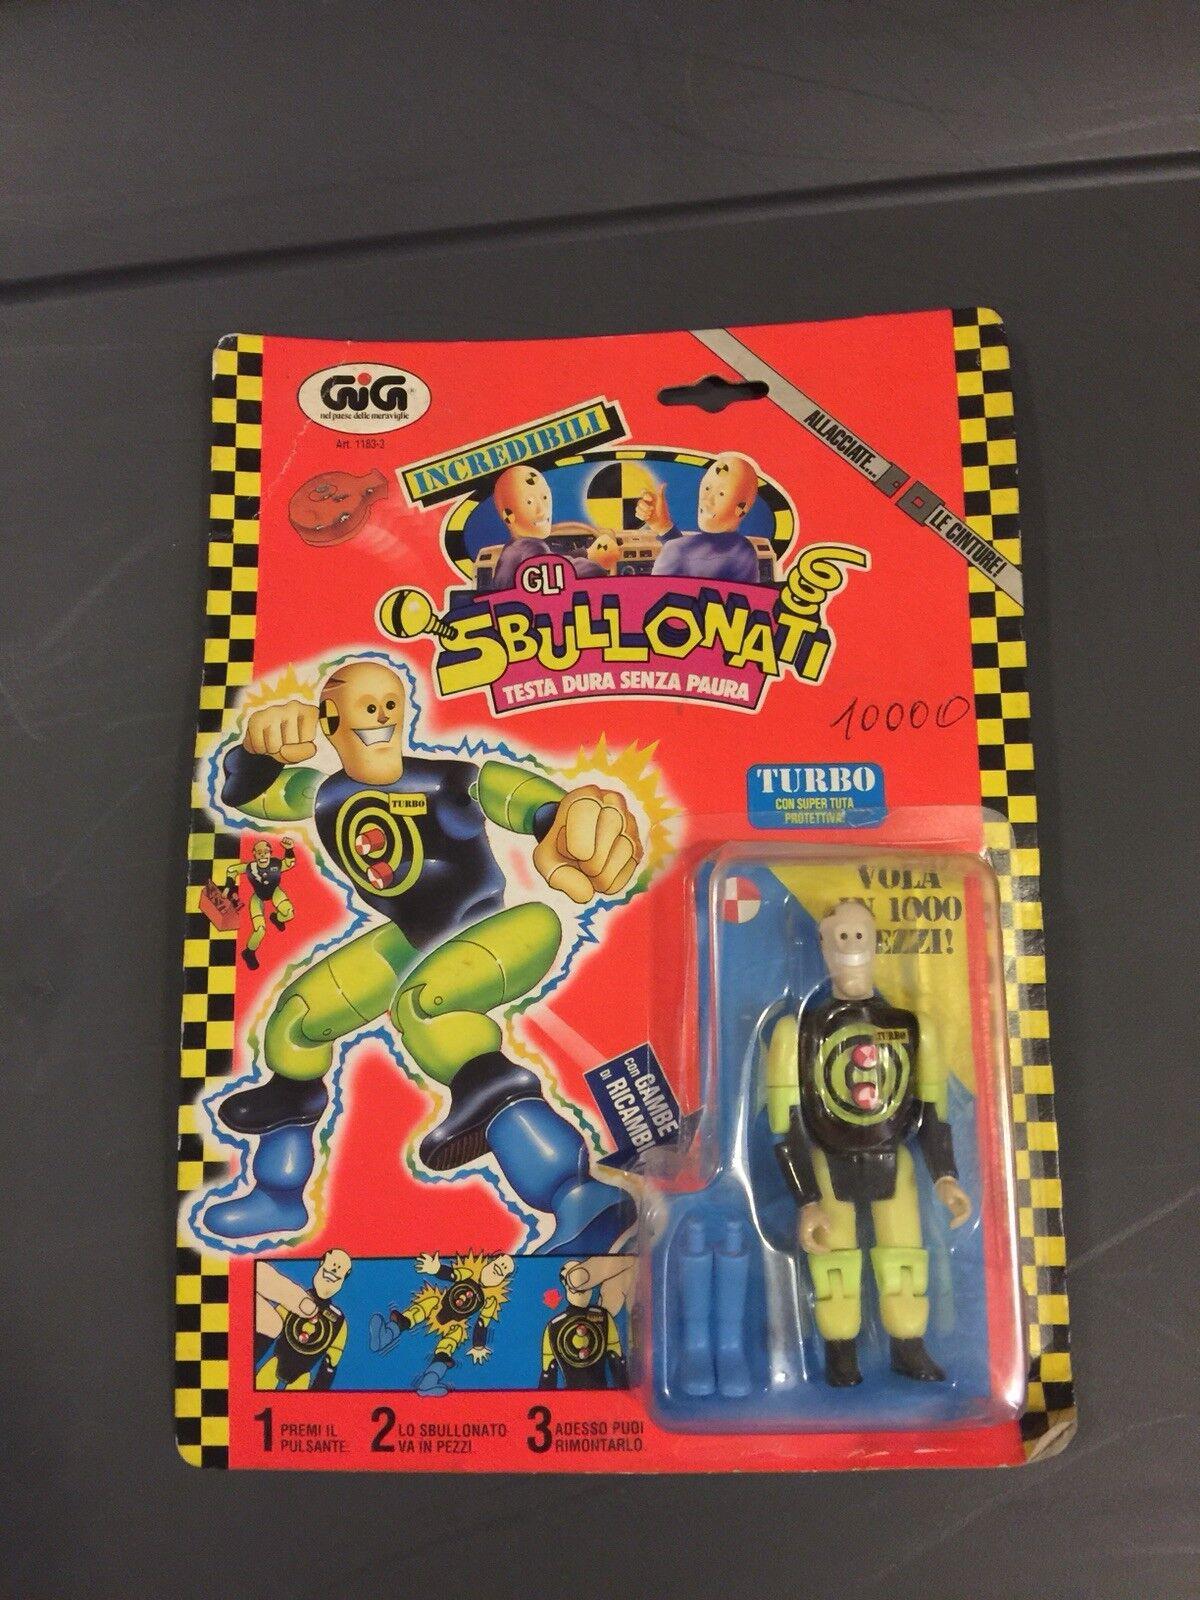 The Incredible Crash Dummies - Gli Sbullonati - Turbo (Dent) Figure - Carded